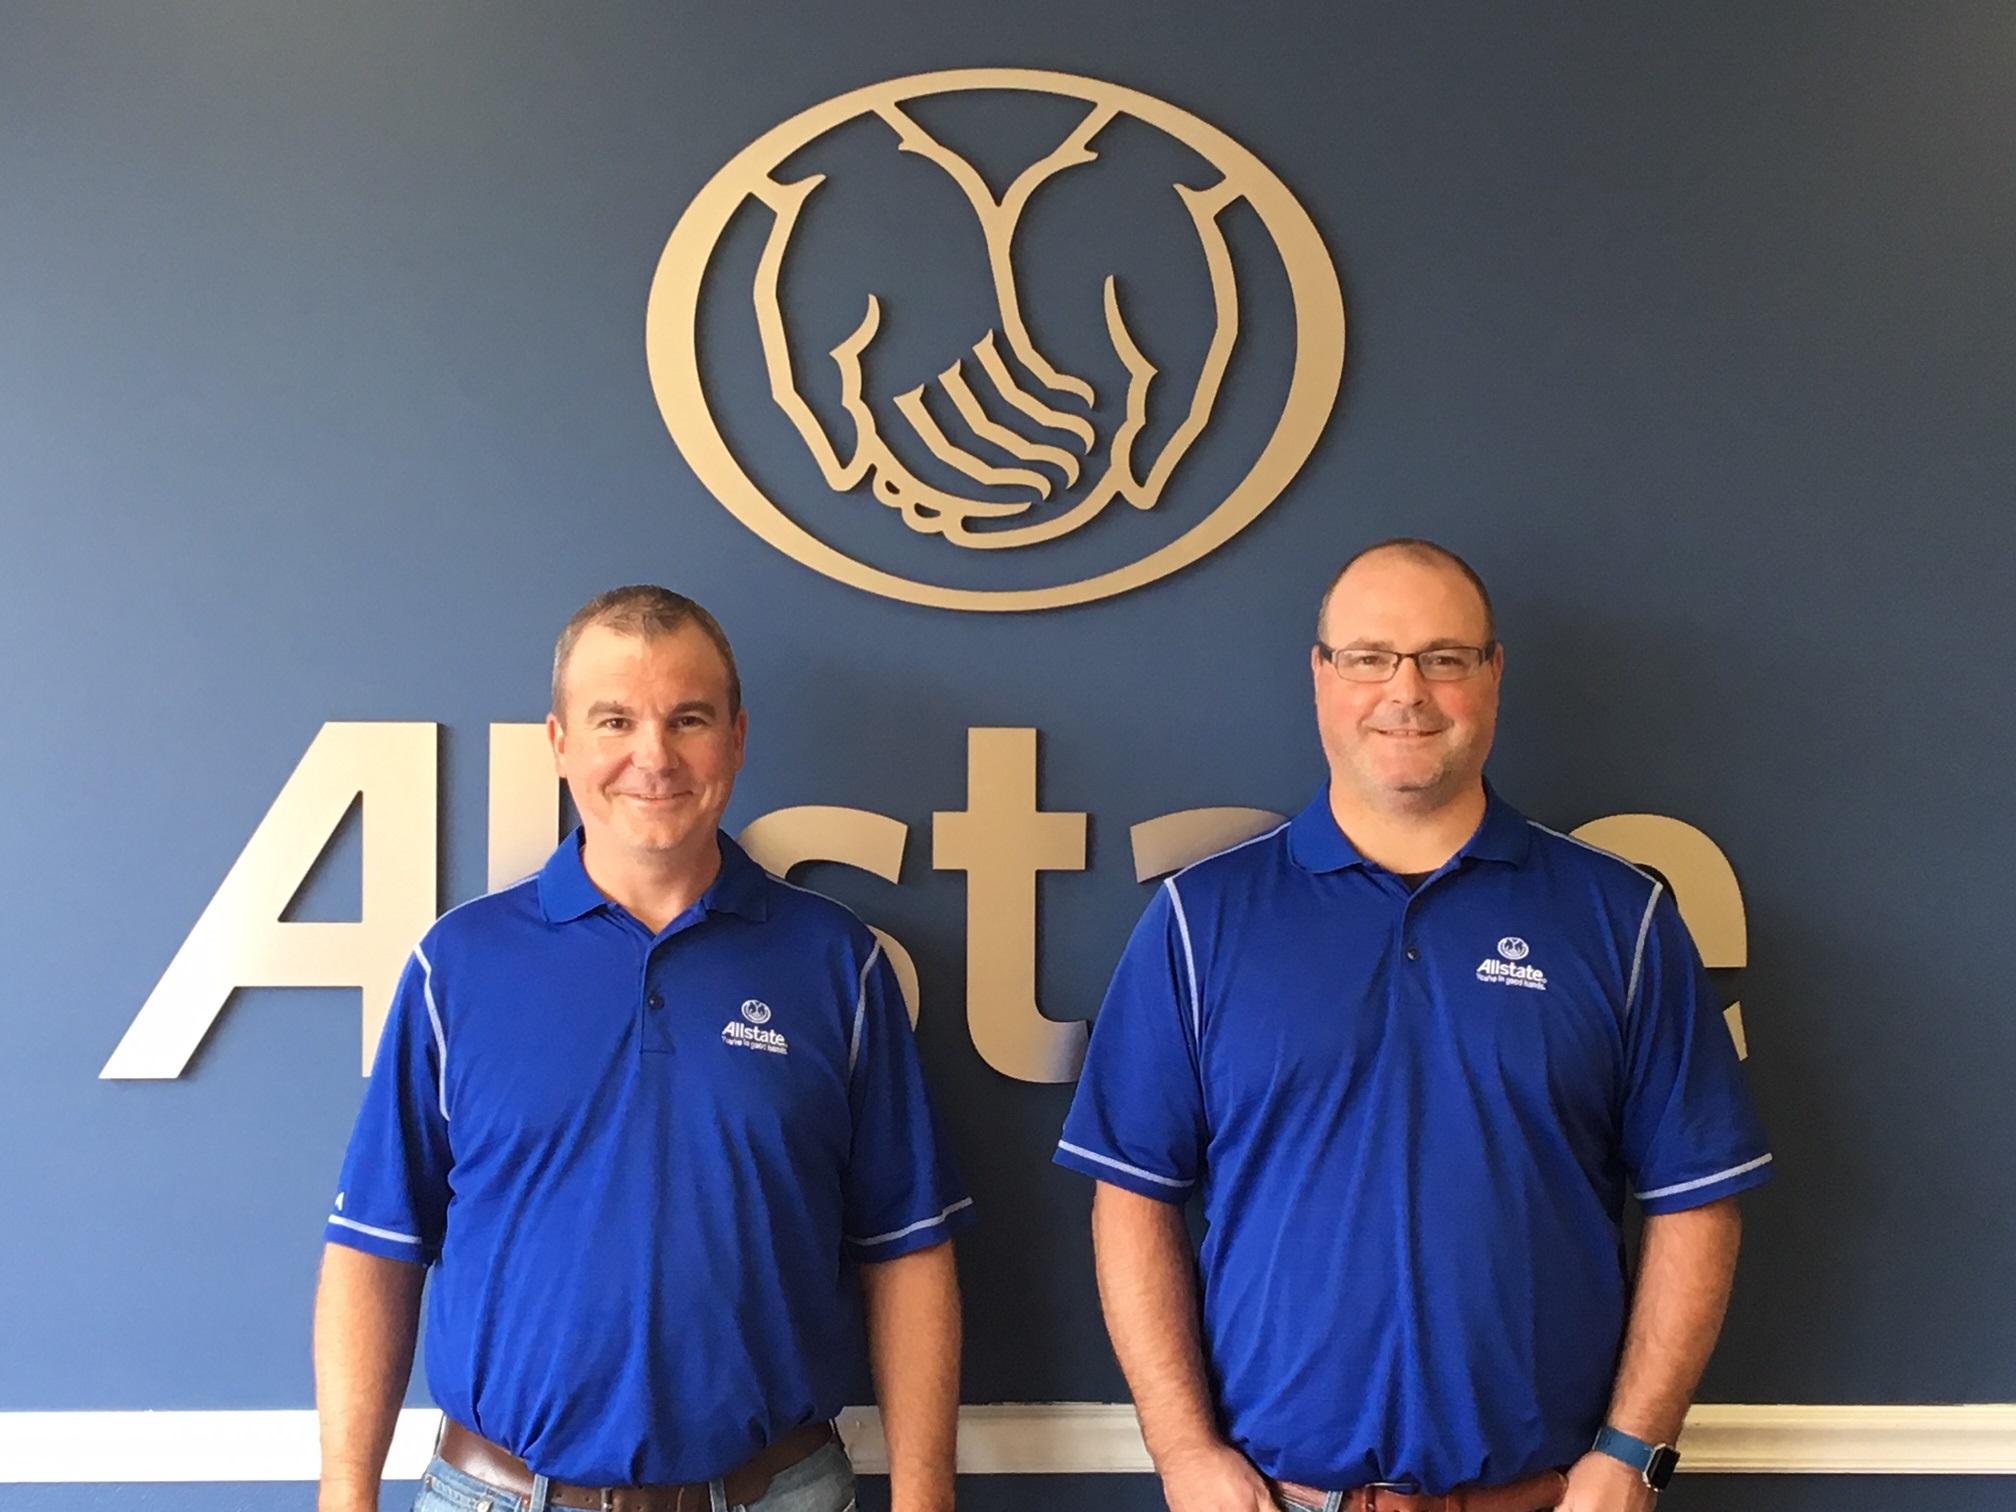 Daniel Broderick: Allstate Insurance